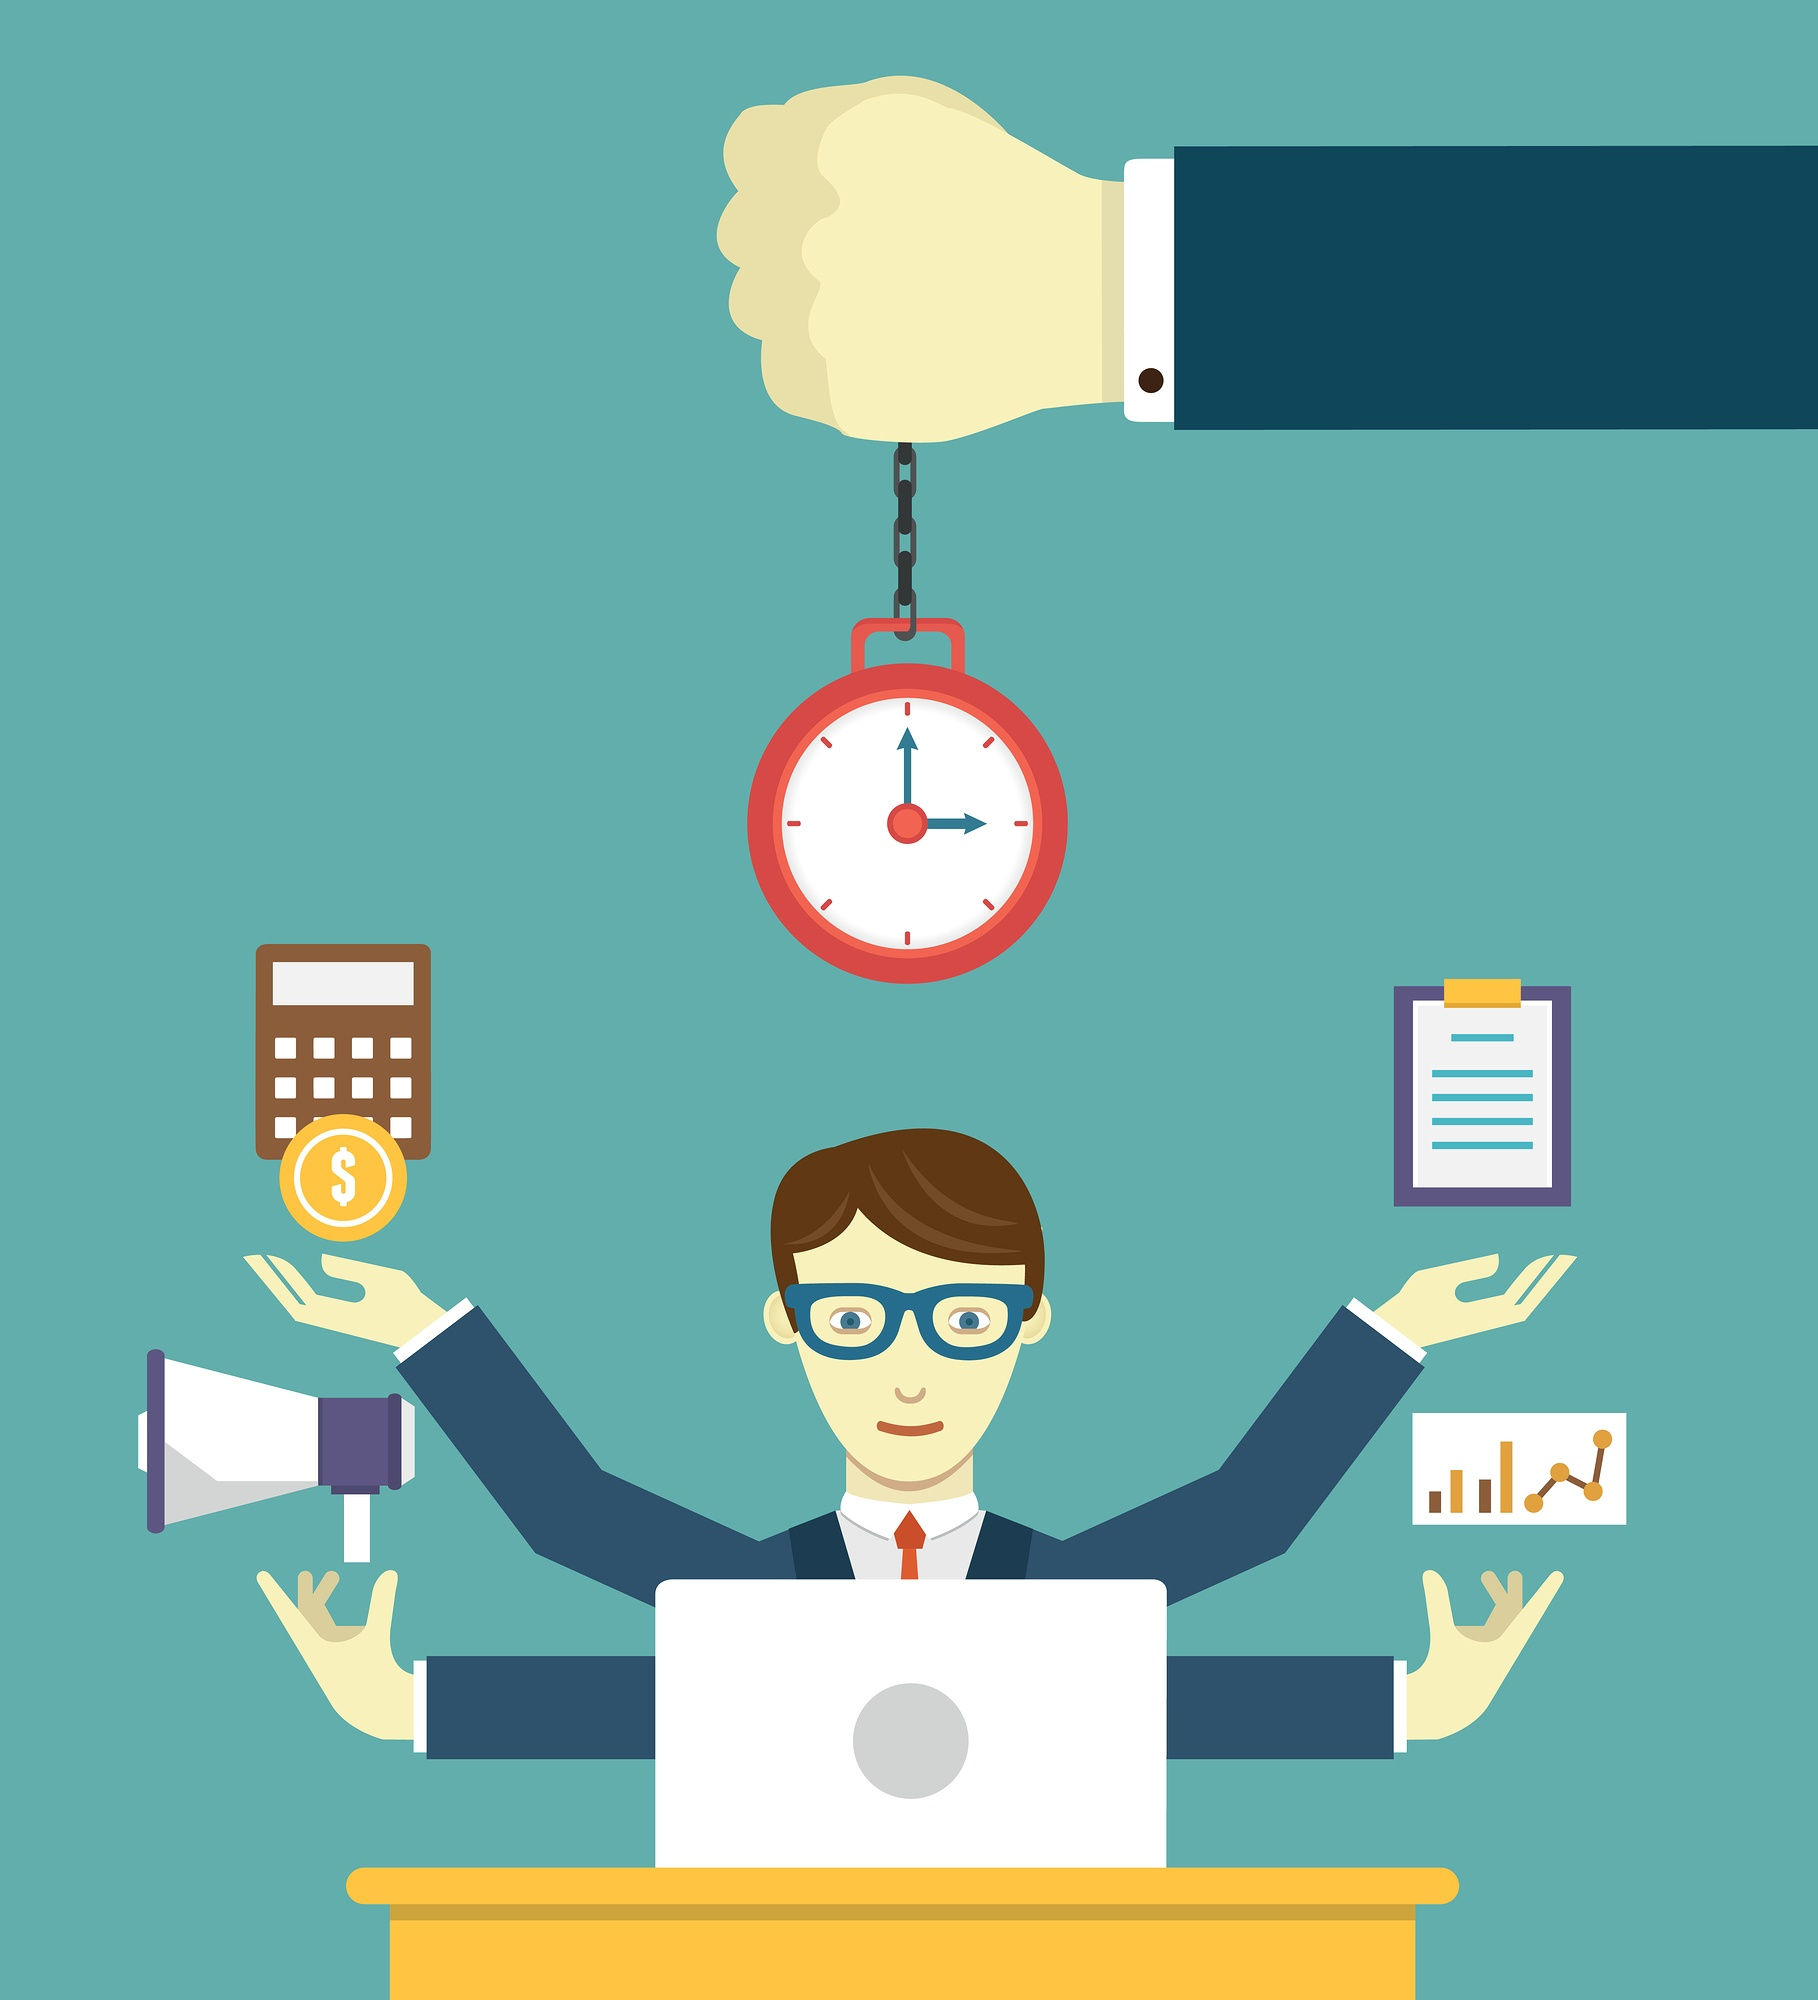 bigstock-Time-Management--Pledge-Of-Su-81341417.jpg